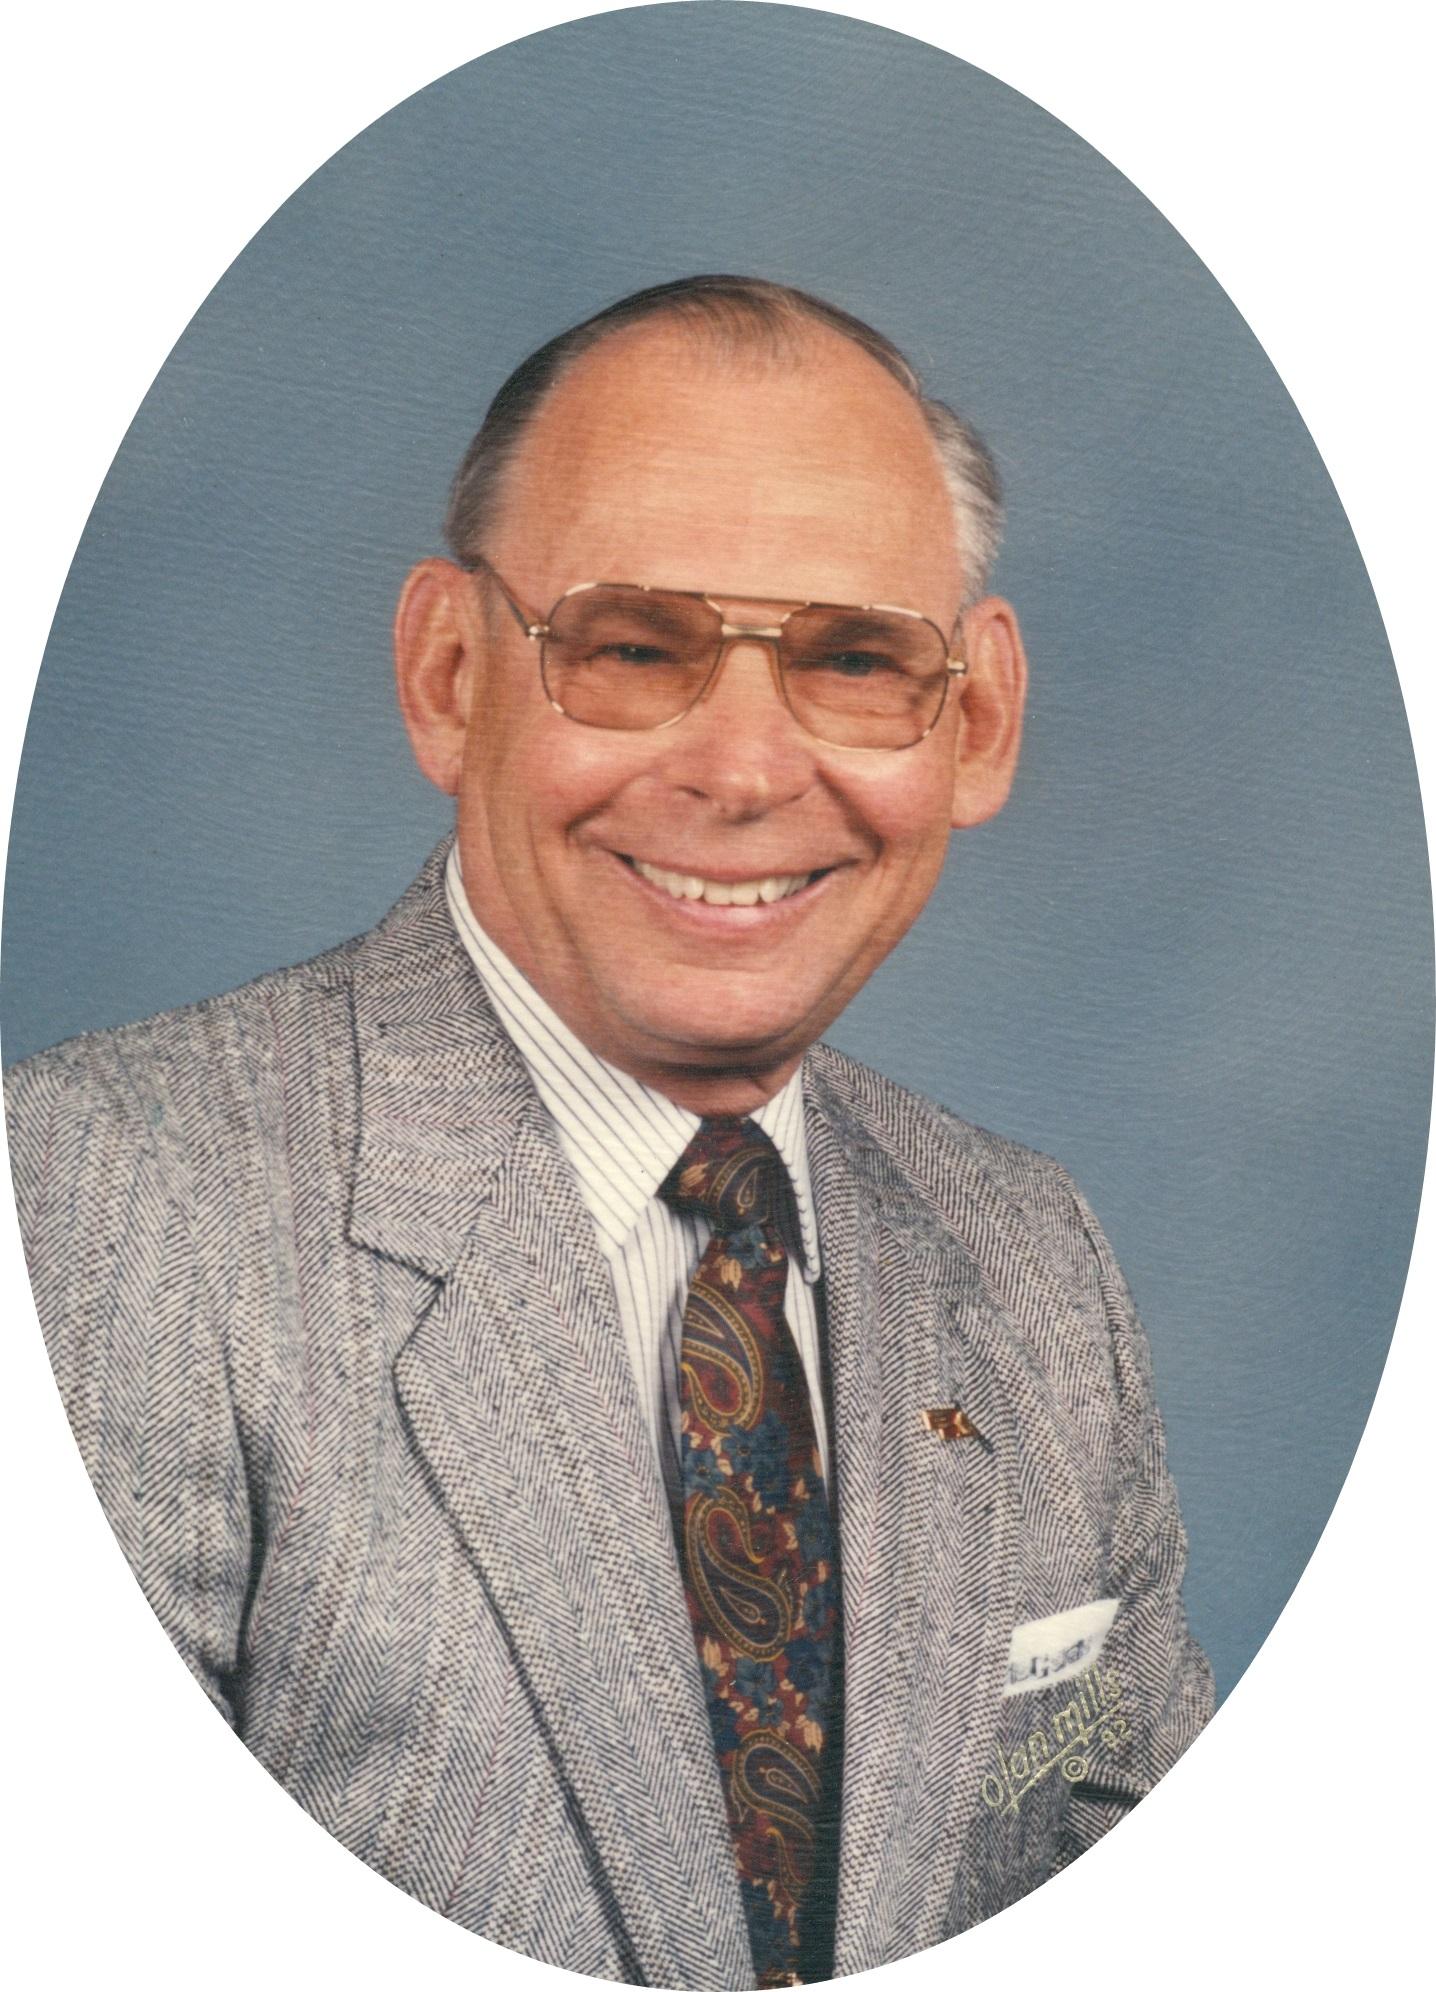 Gerald D. 'Jerry' Verbeek, age 90, of Fremont, Nebraska